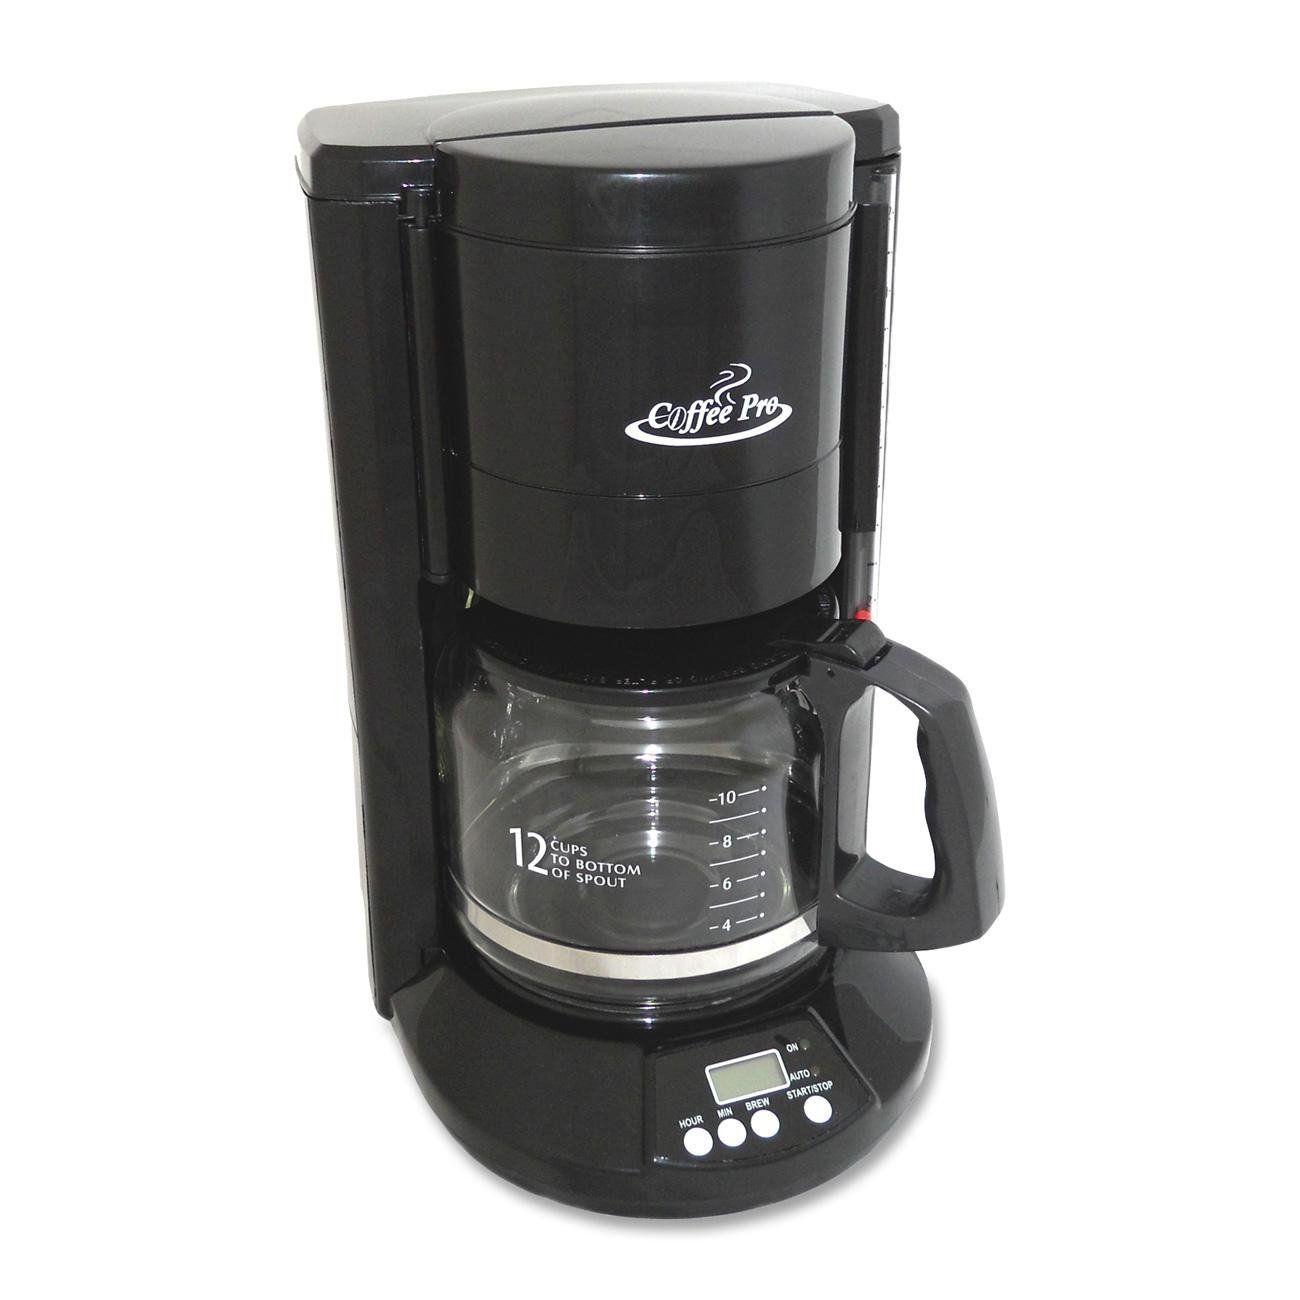 Coffee pro cfpcp333b coffee makers 10 length 10 width